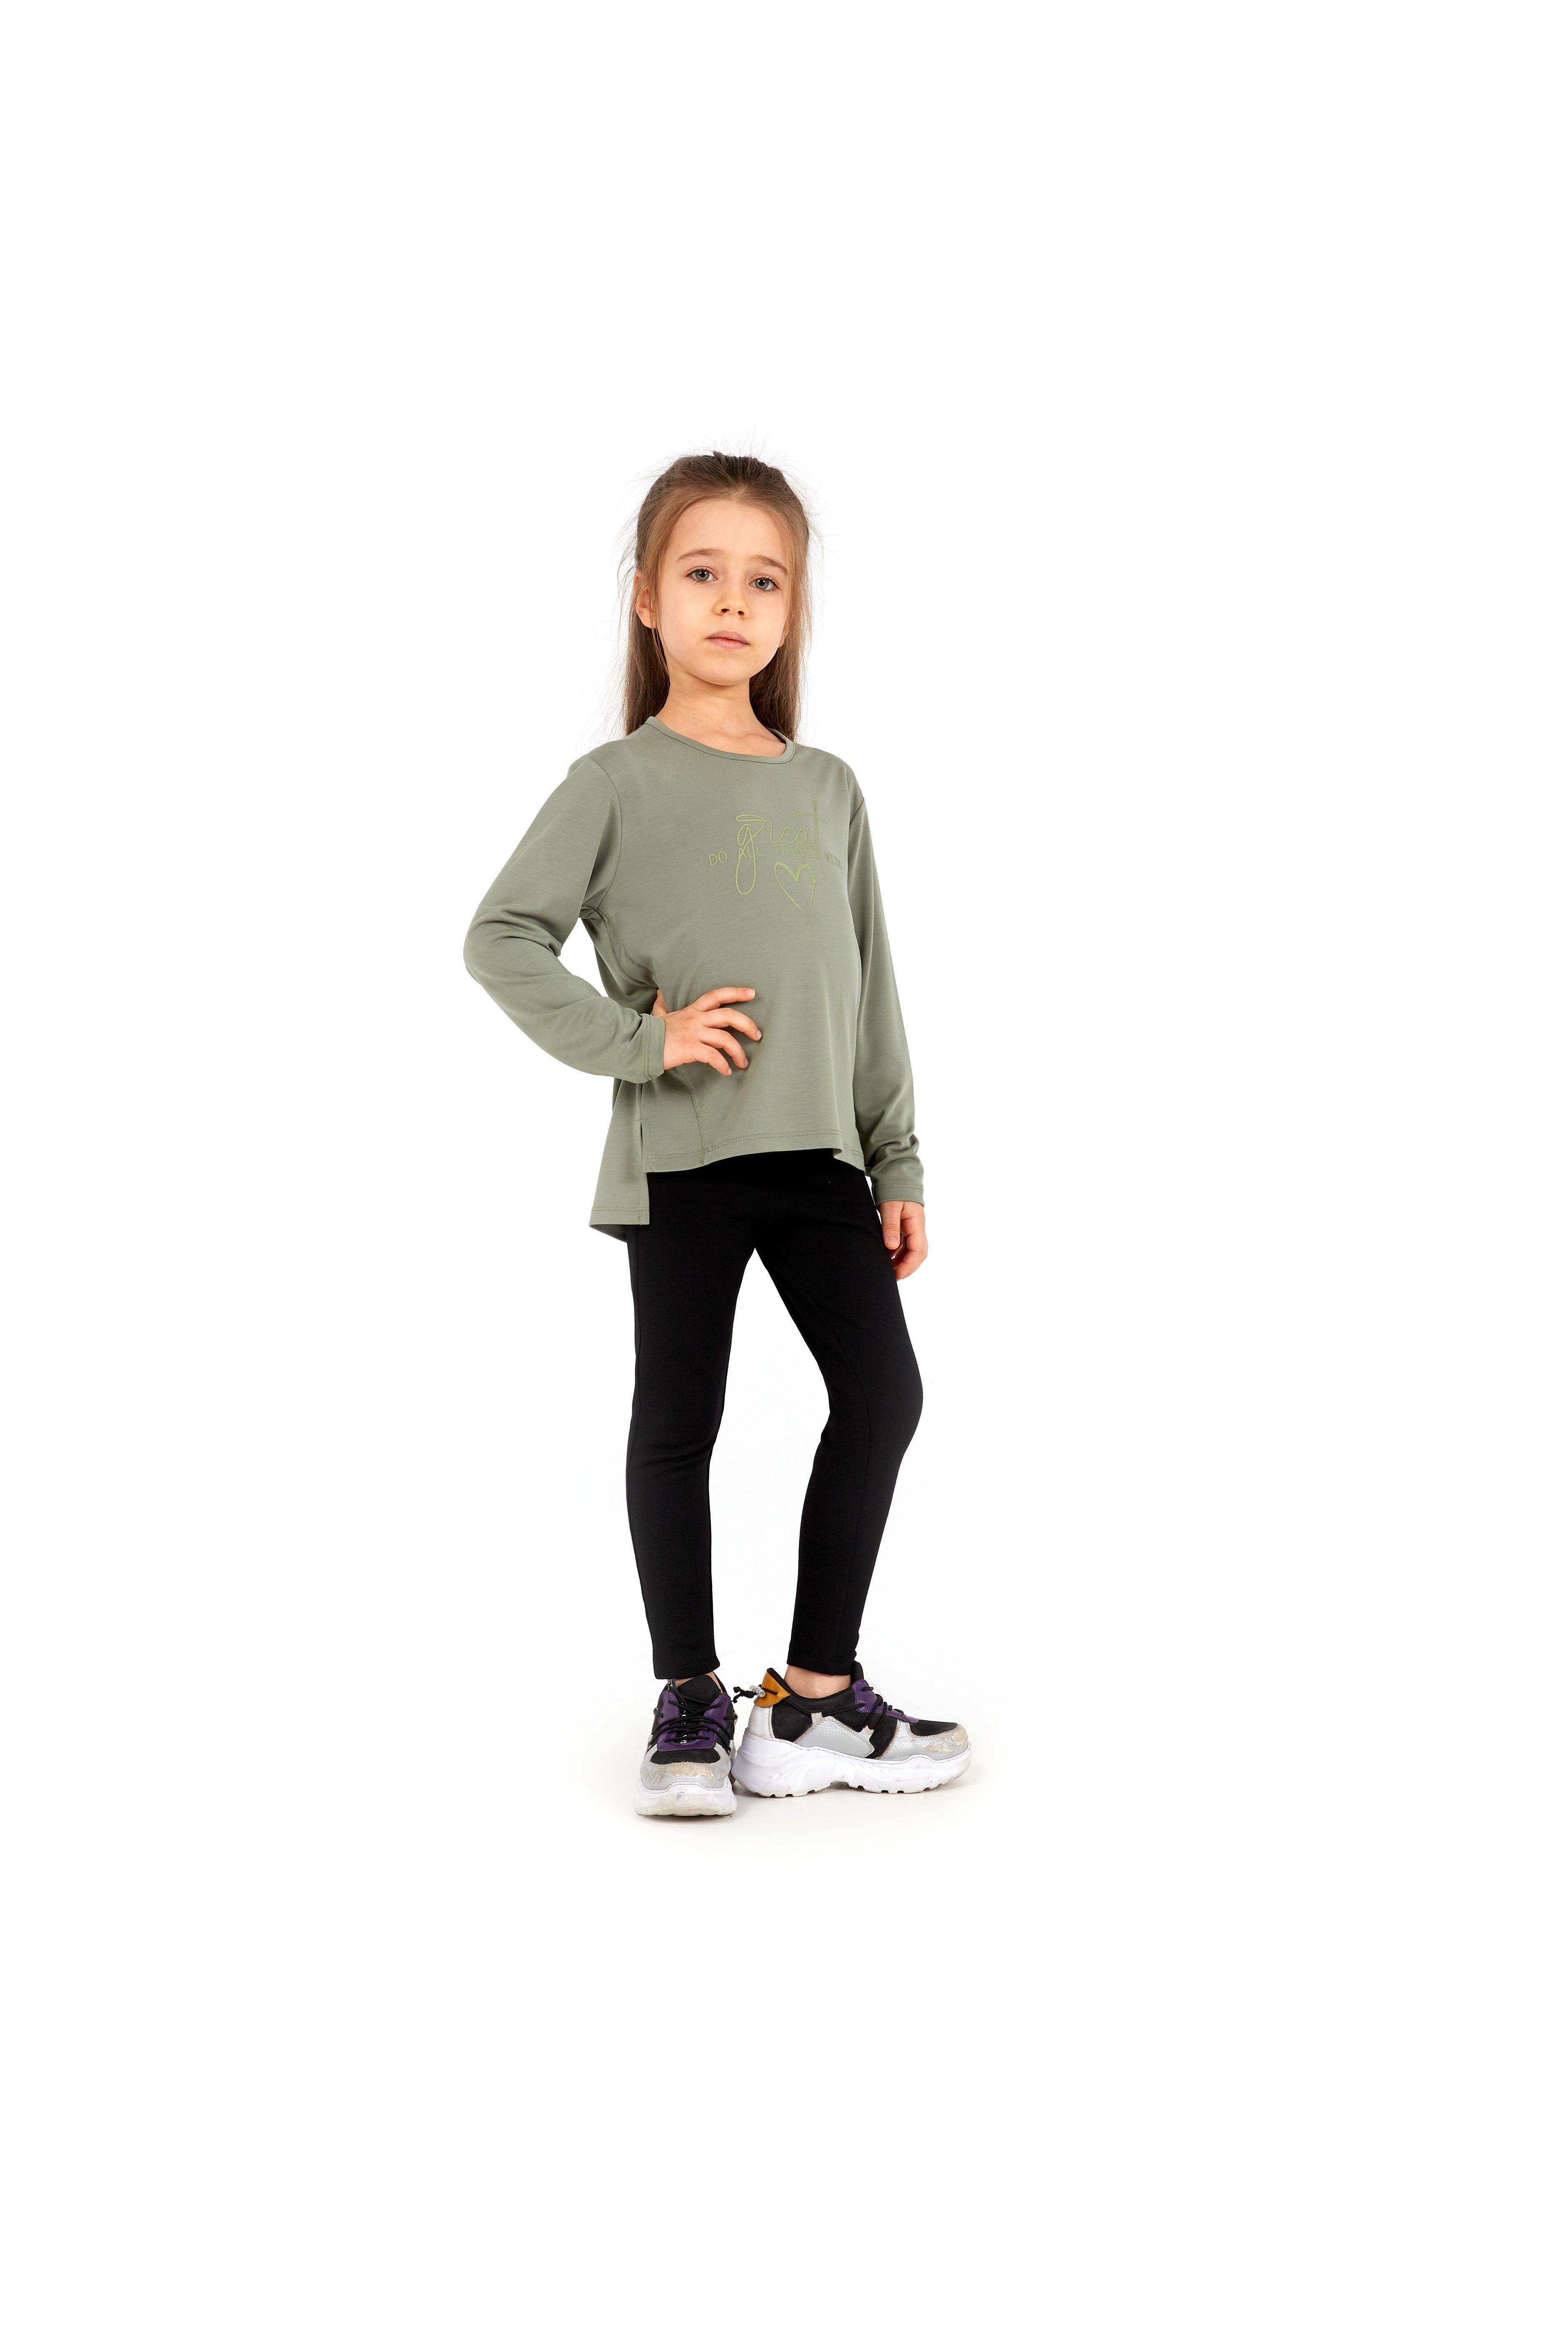 Kız Çocuk Sweatshirt 60048 - Haki - Thumbnail